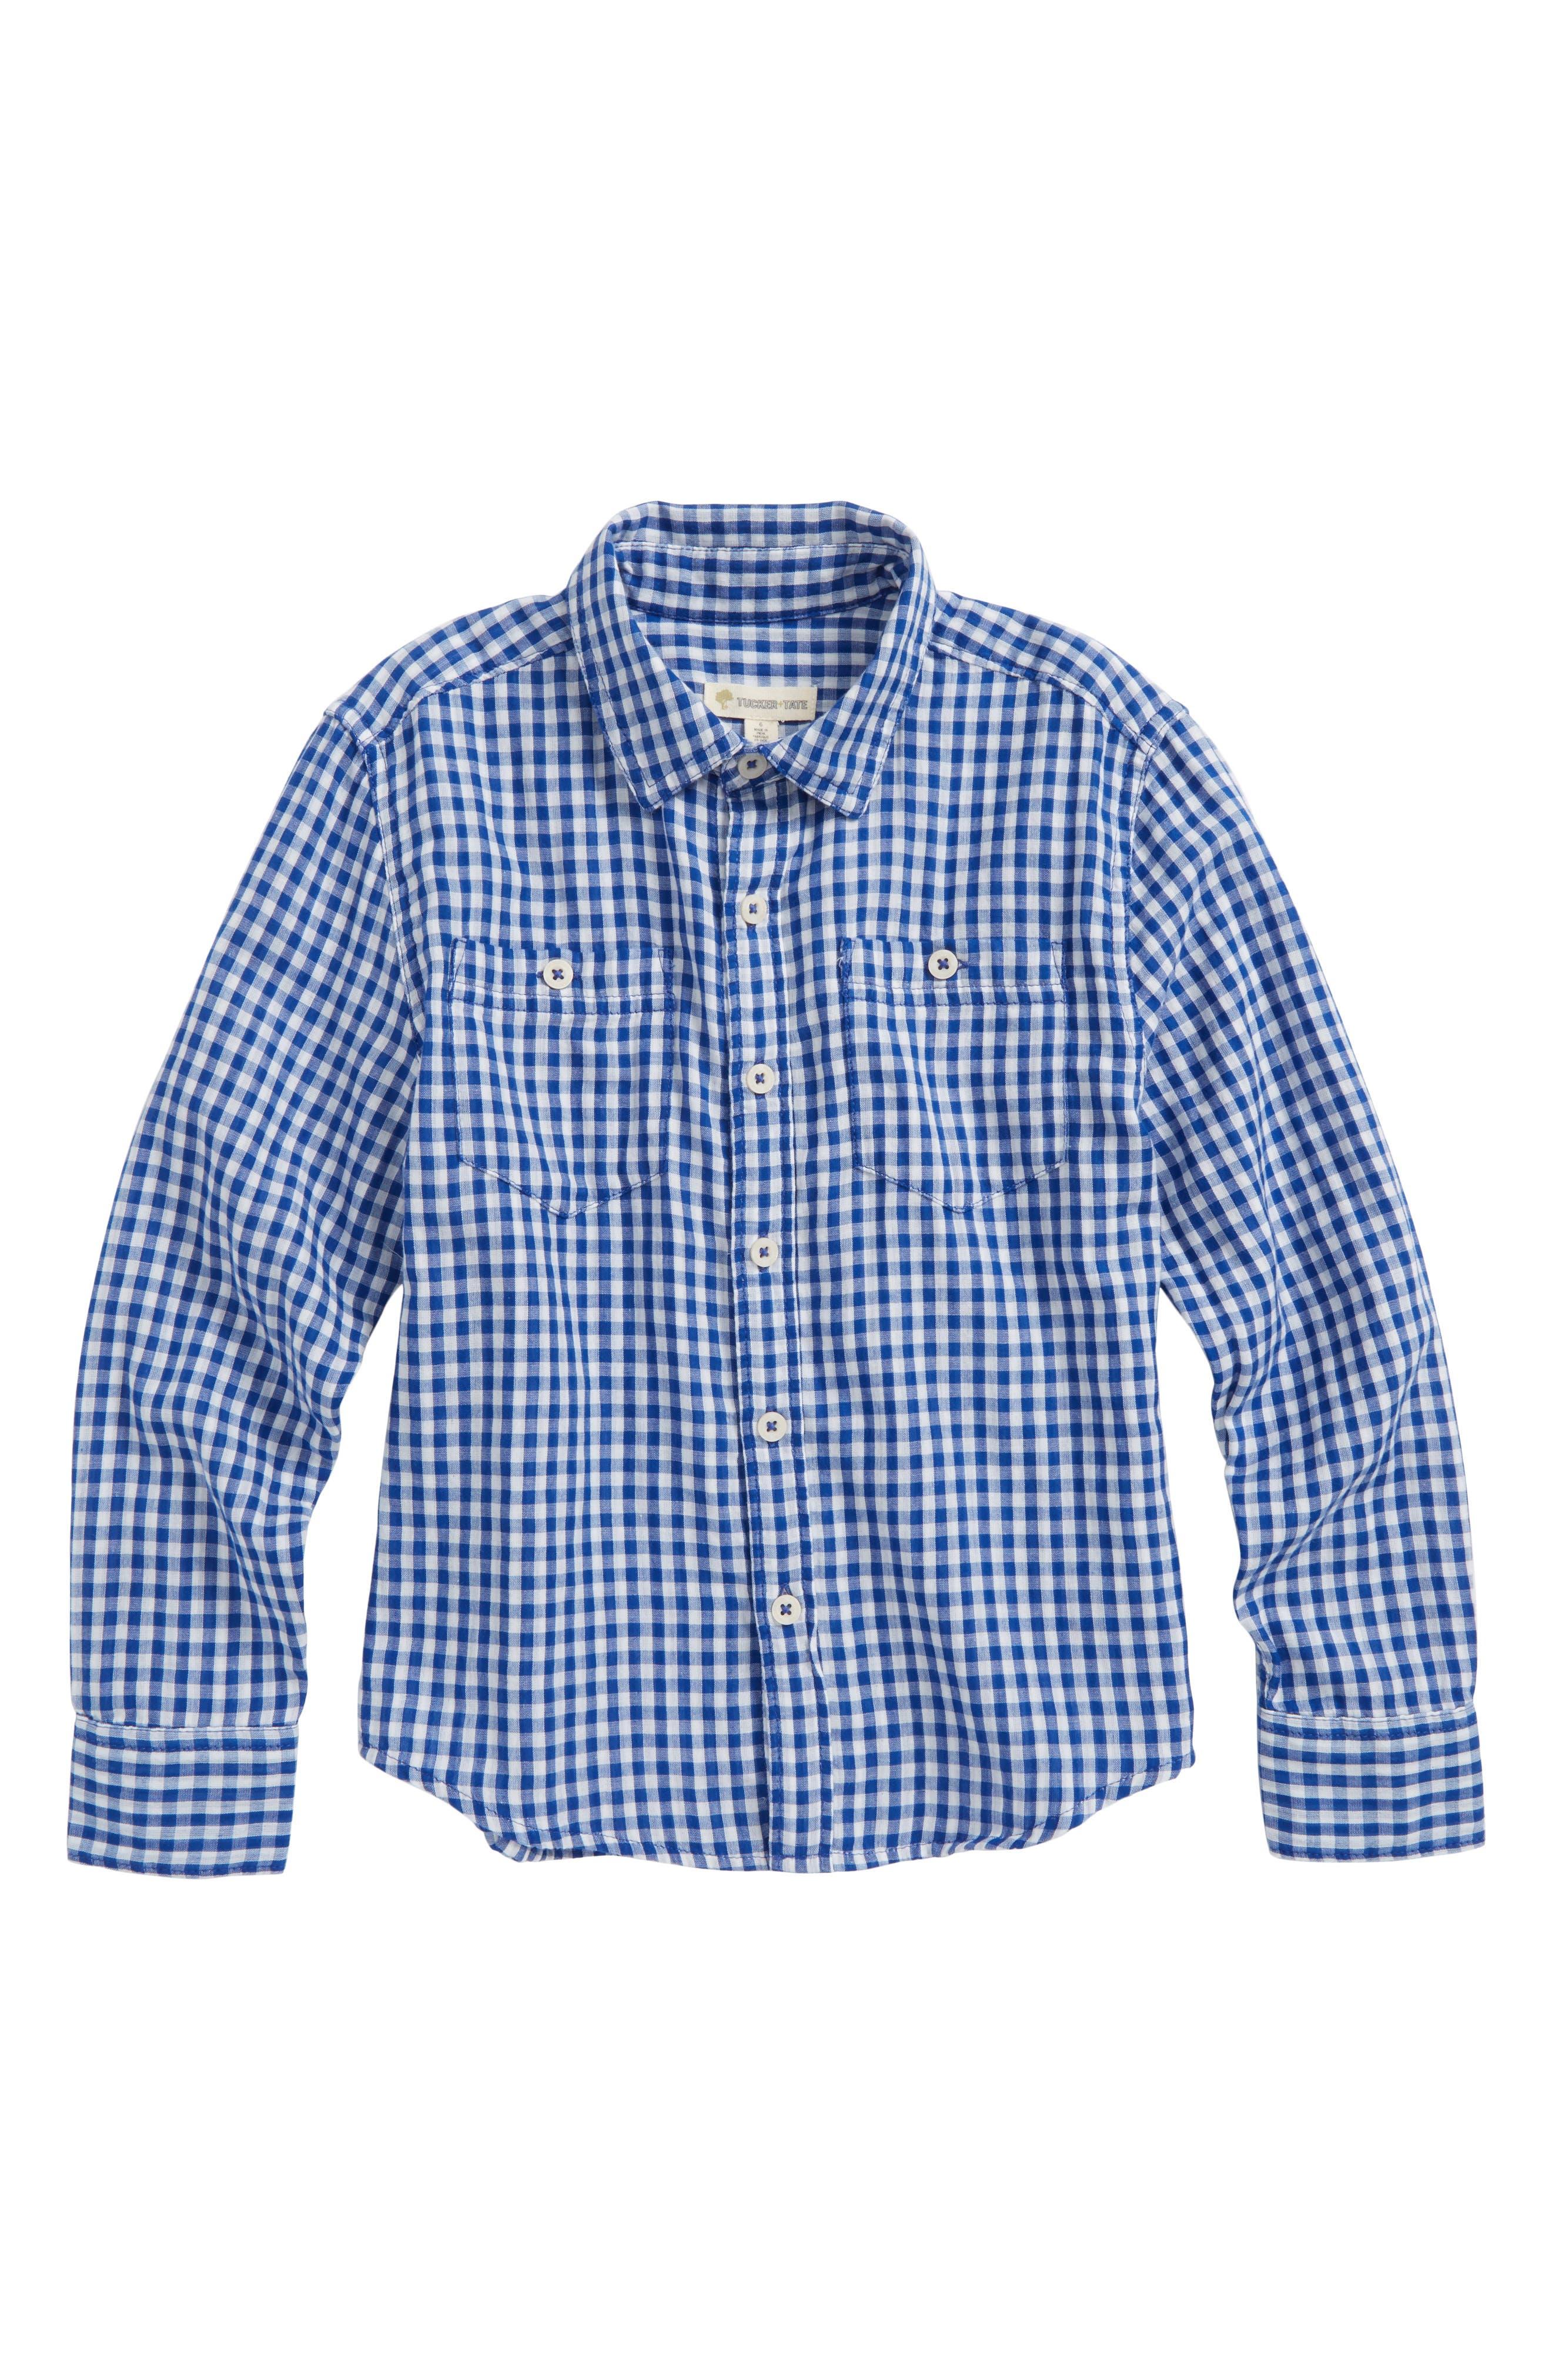 Main Image - Tucker + Tate Double Cloth Shirt (Toddler Boys & Little Boys)